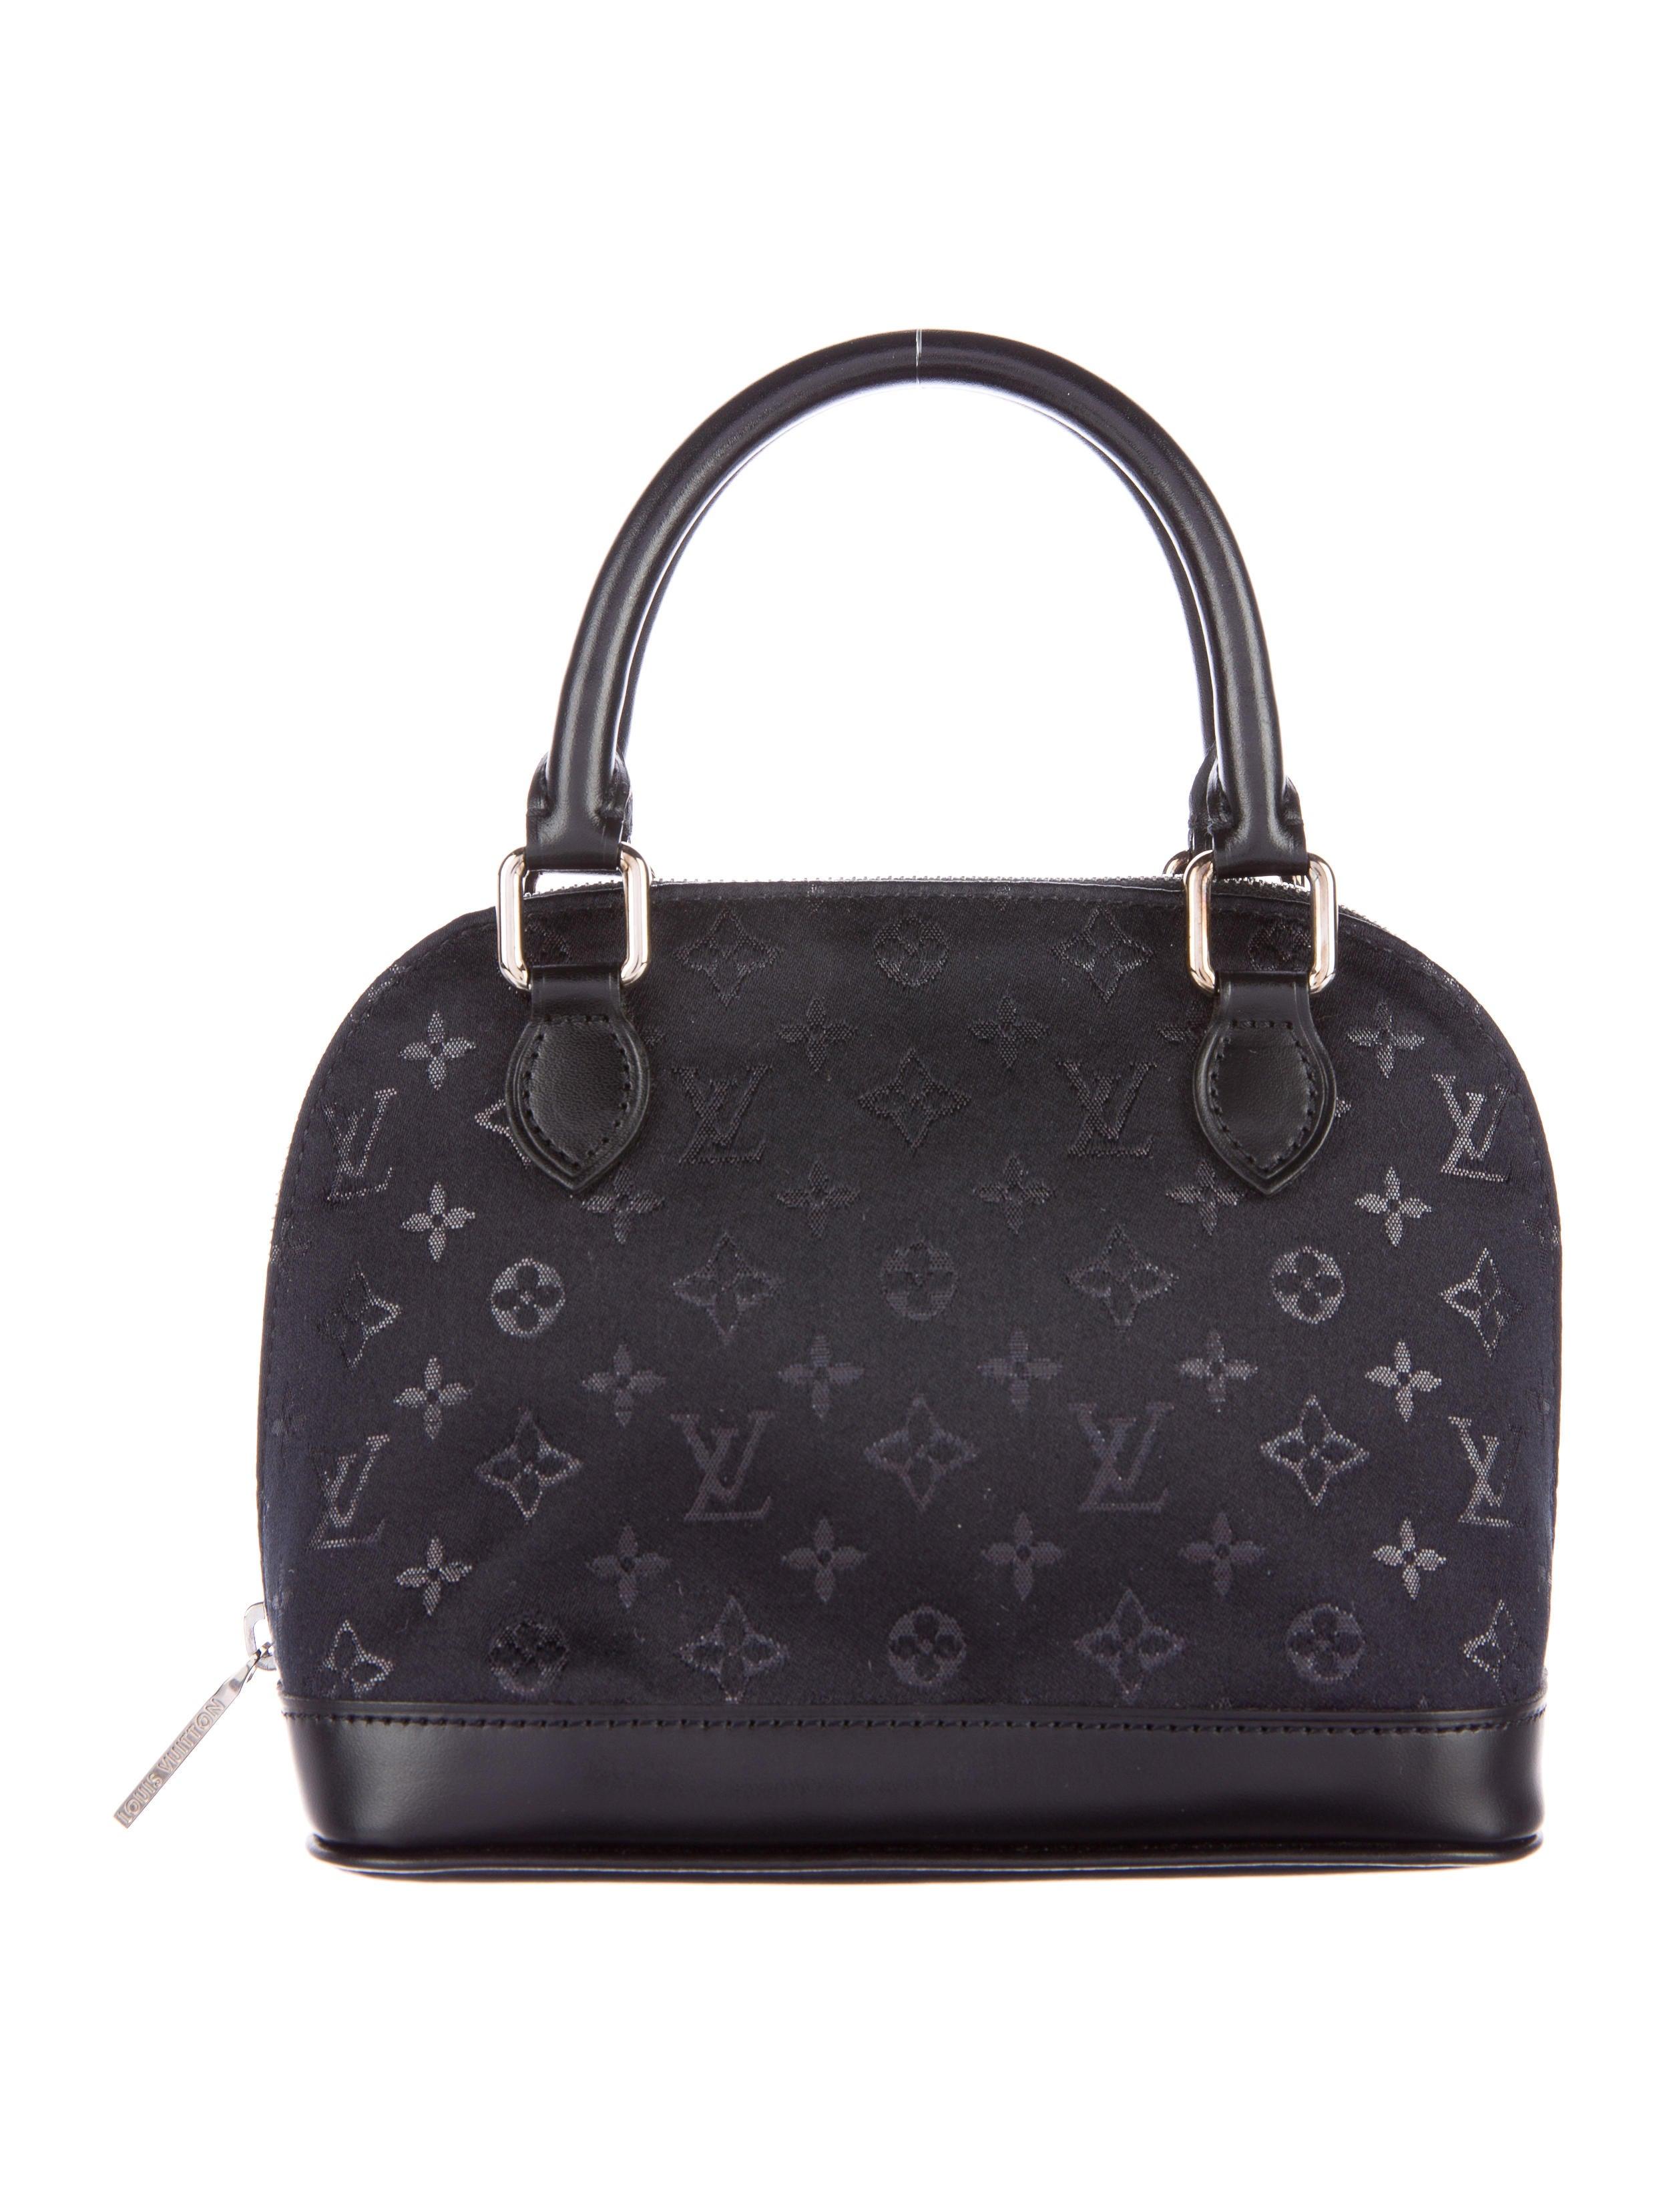 Louis vuitton monogram satin nano alma bag handbags for Louis vuitton miroir alma bag price